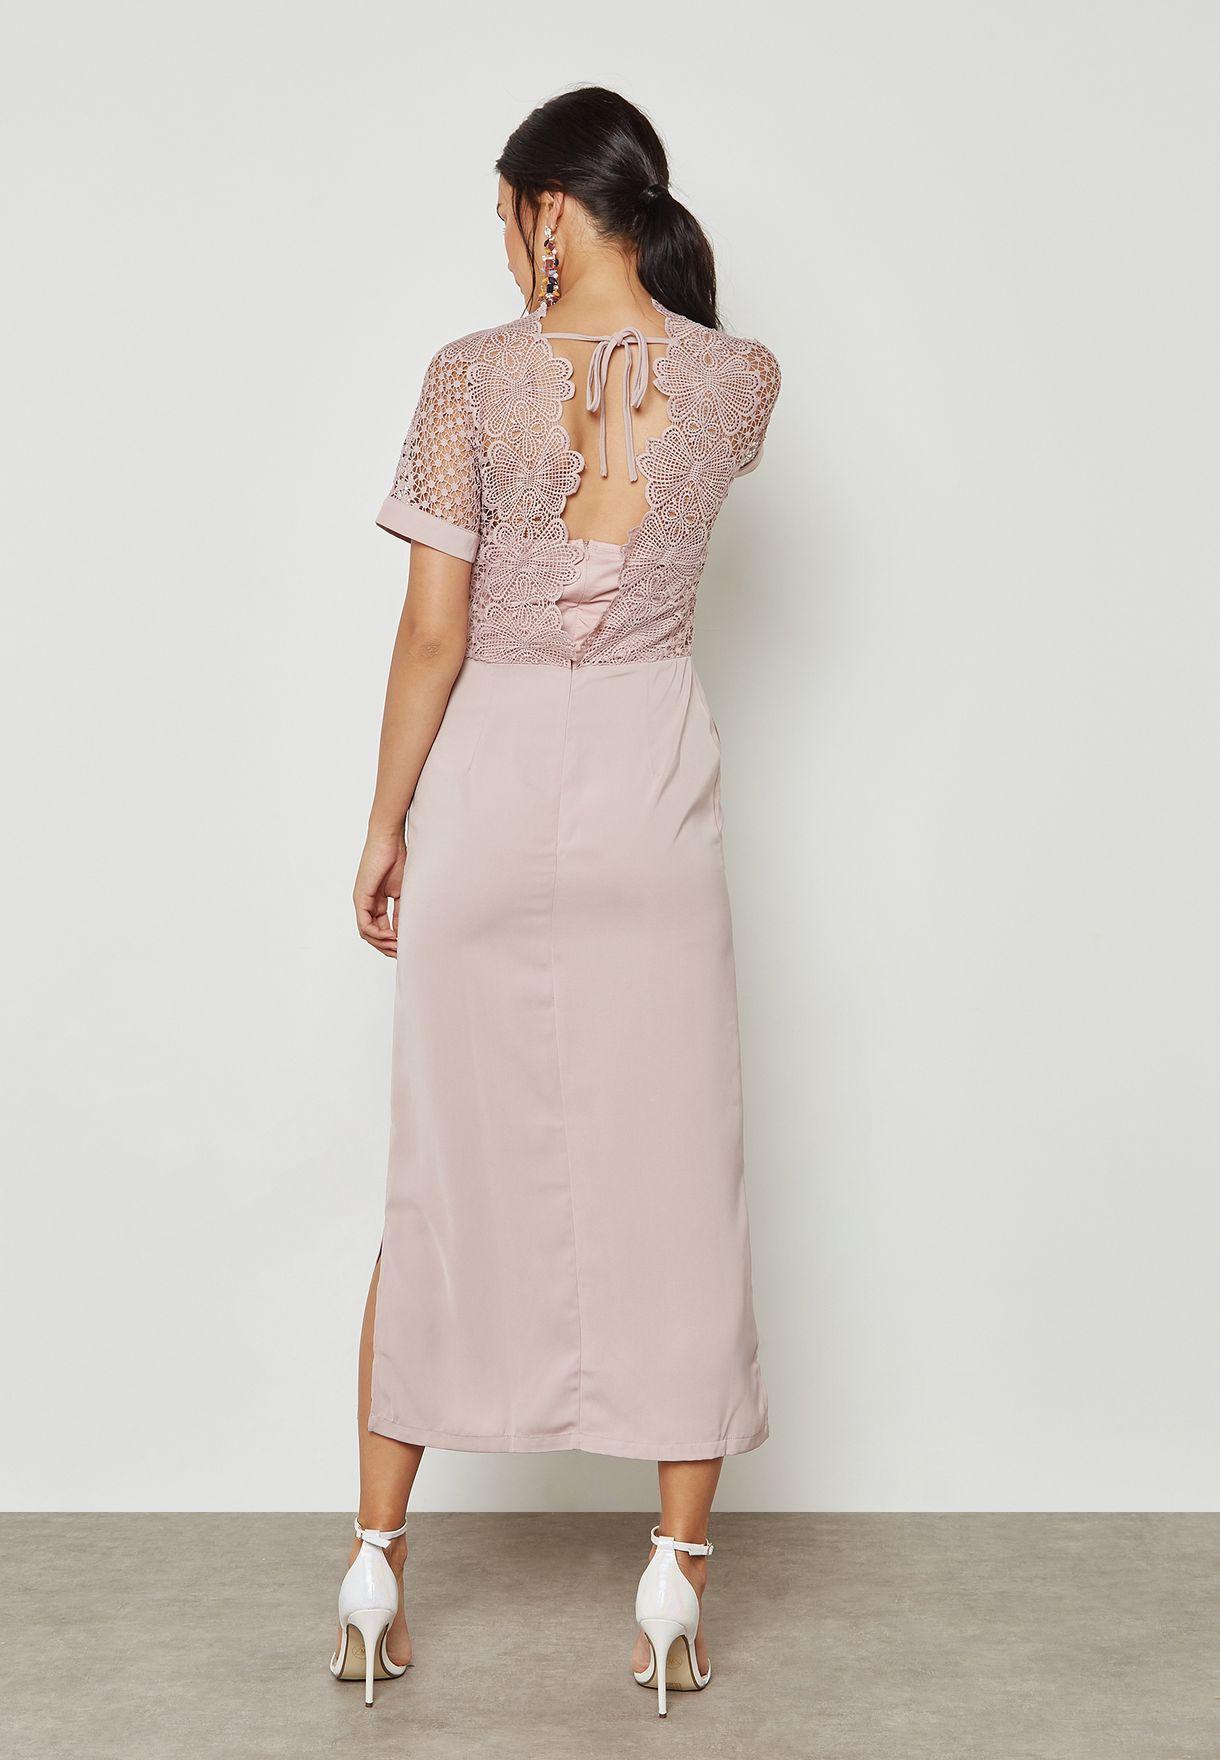 فستان مكسي بأجزاء دانتيل كروشيه